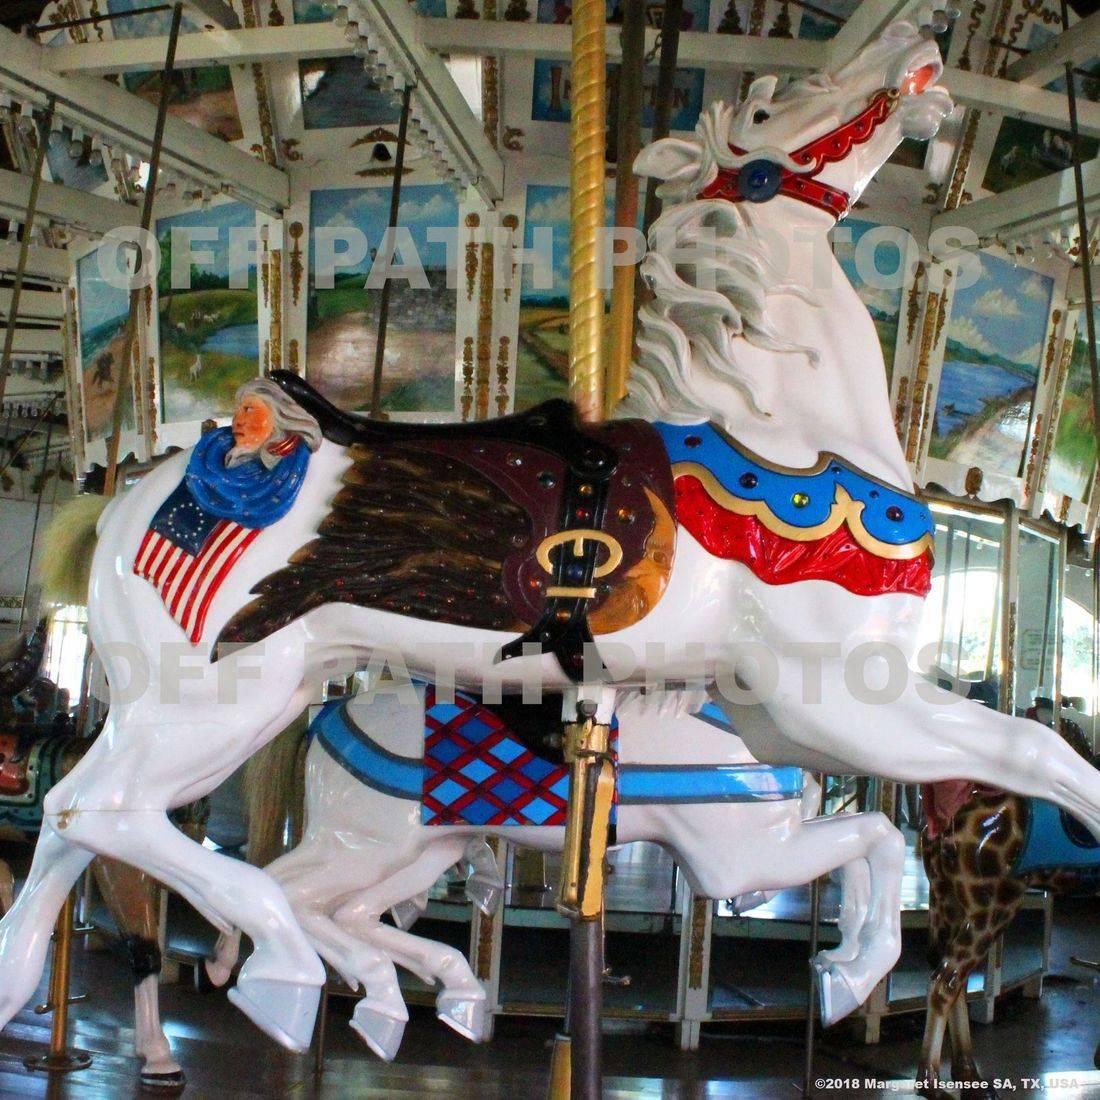 photography, antique carousels, patriotic, horses, amusement park, rides, merry-go-round